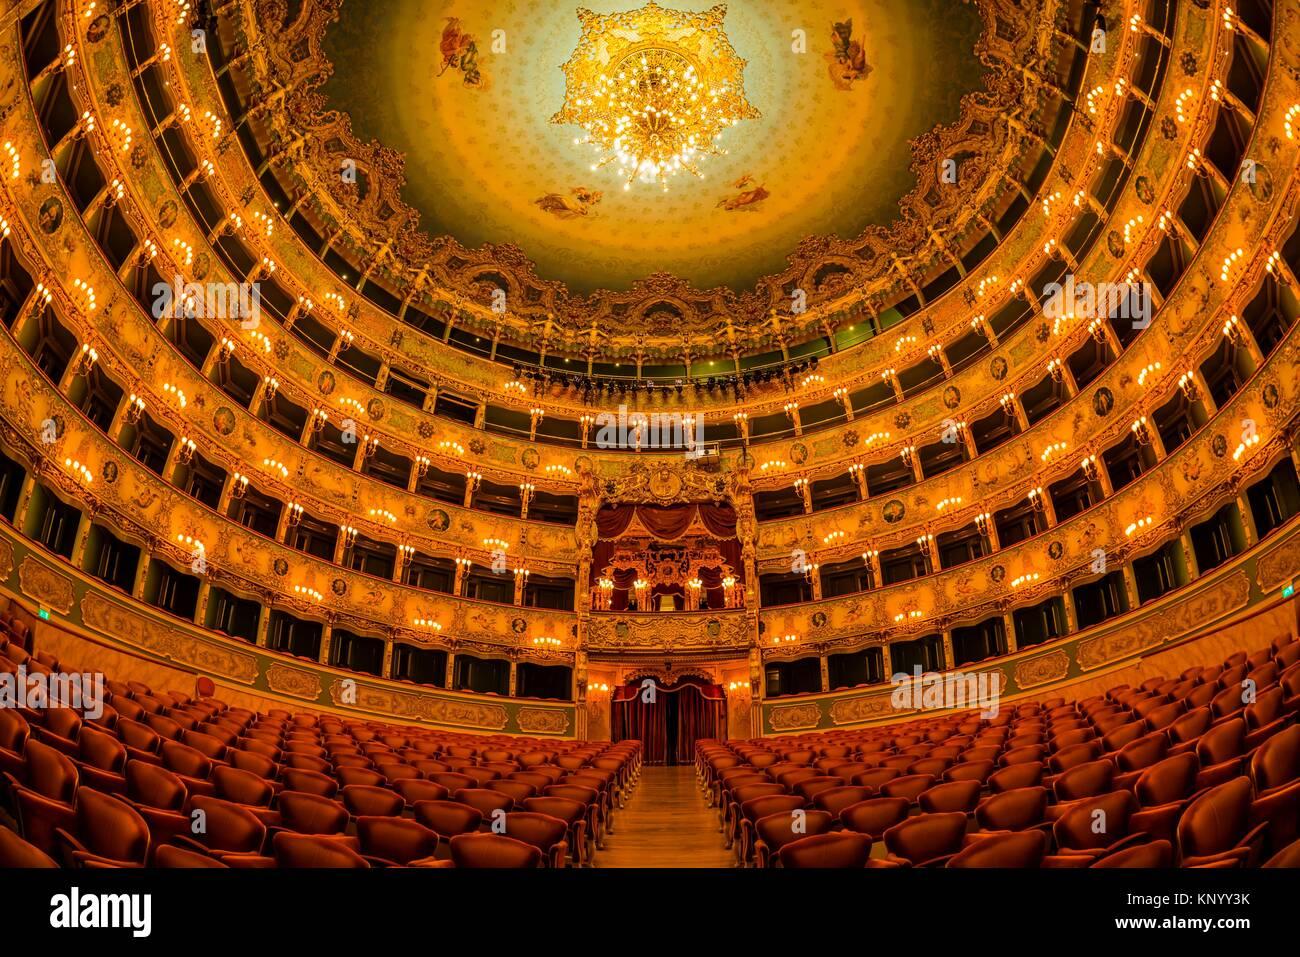 Teatro La Fenice (Theater La Fenice) Oper, Venedig, Italien. Stockbild